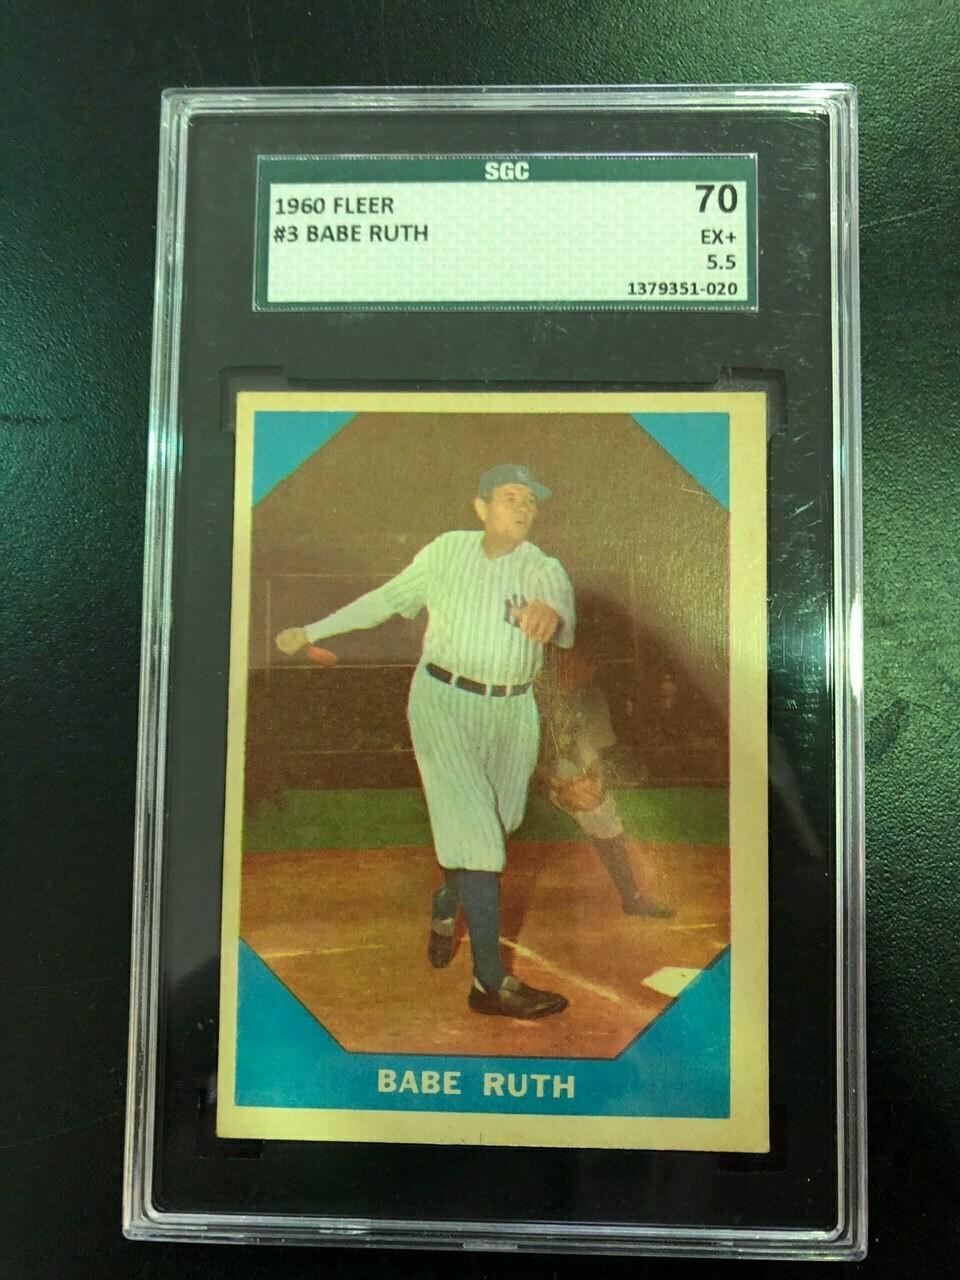 1960 Fleer #3 Babe Ruth SGC graded 5.5, $100